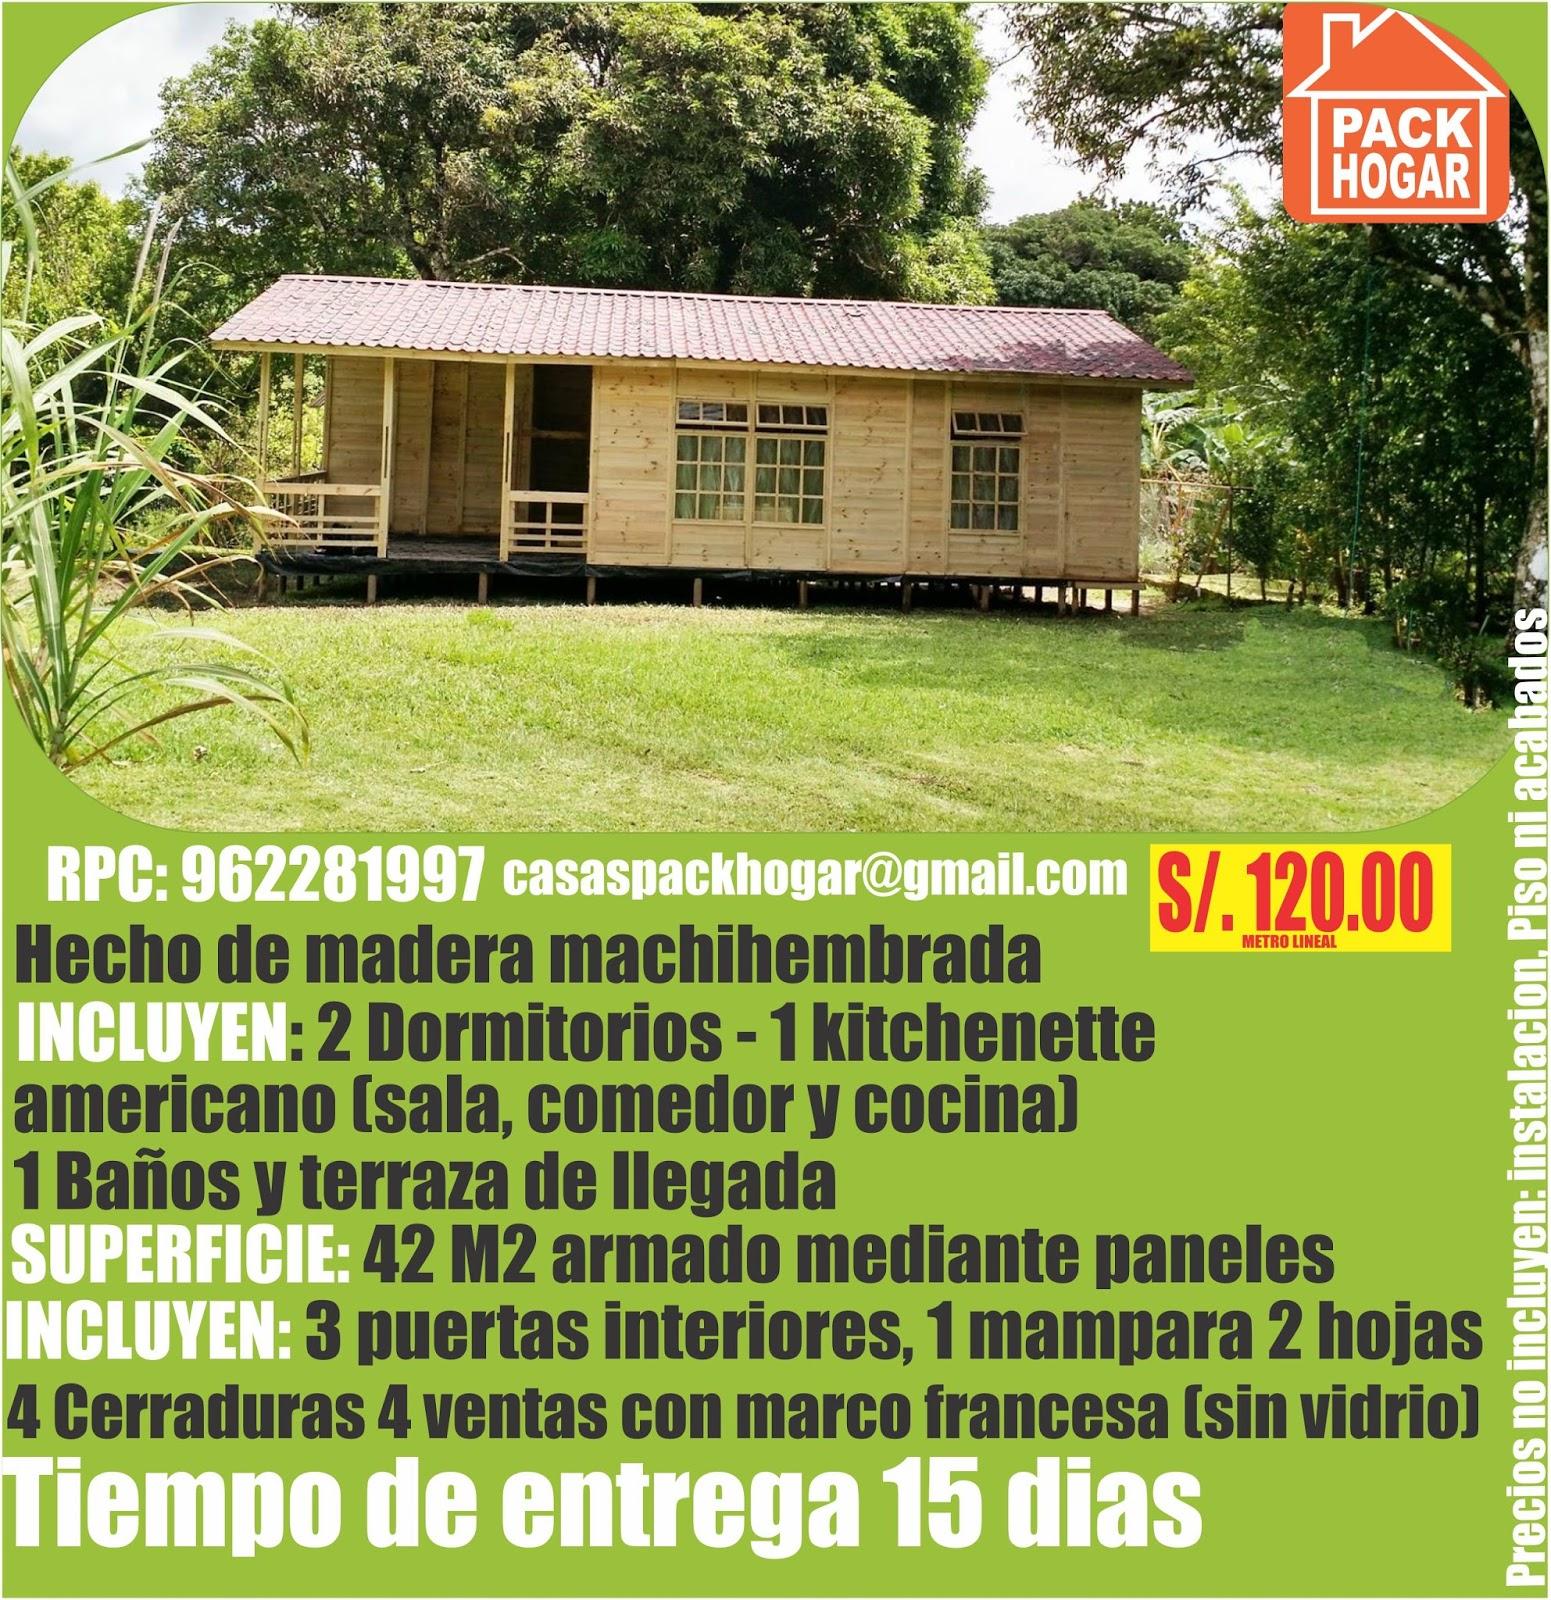 Casas de madera casas de campo casas de playa - Casas de campo madera ...